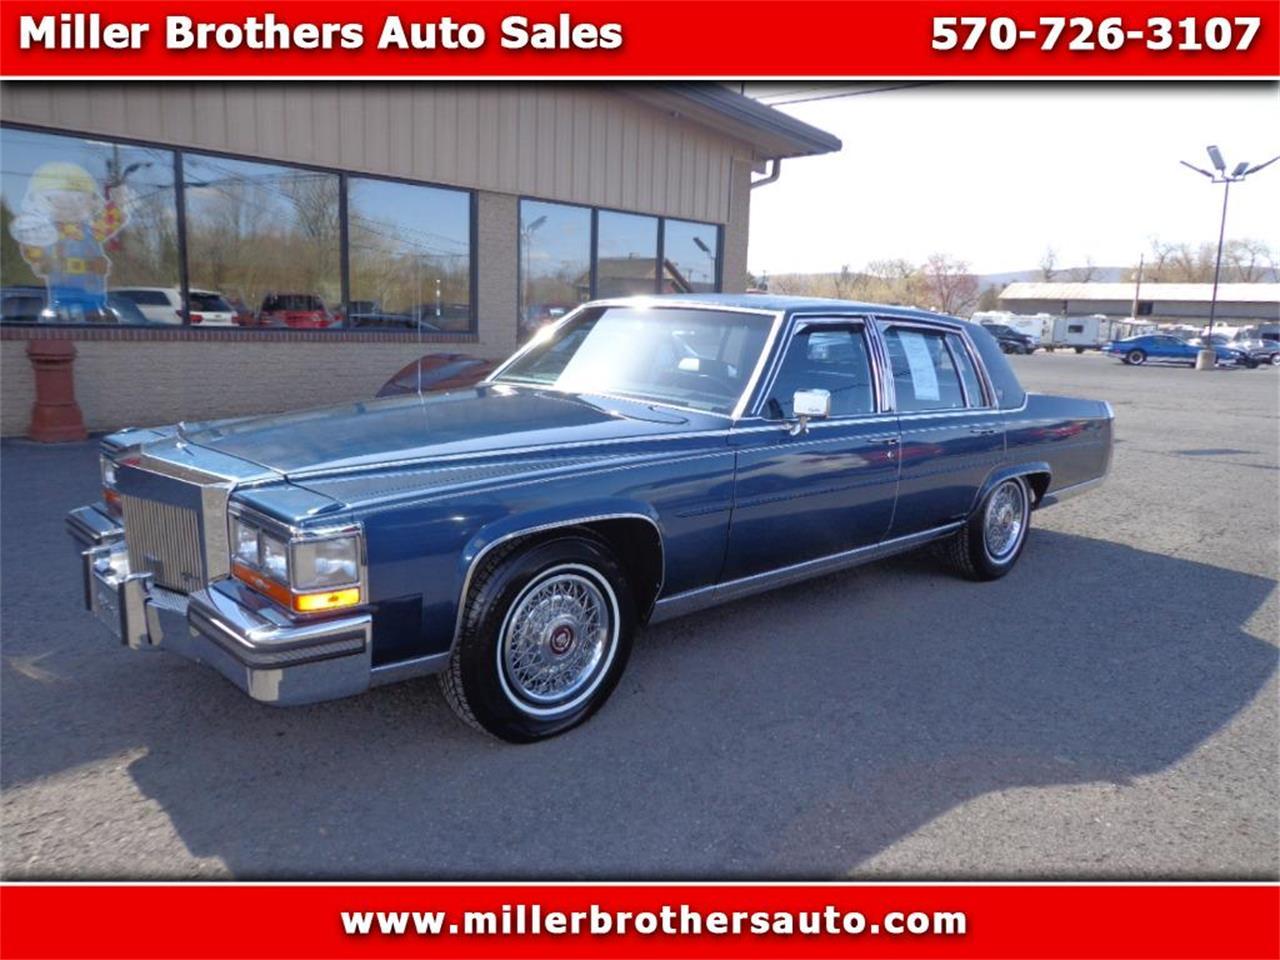 1989 cadillac brougham for sale classiccars com cc 1143911 1989 cadillac brougham for sale